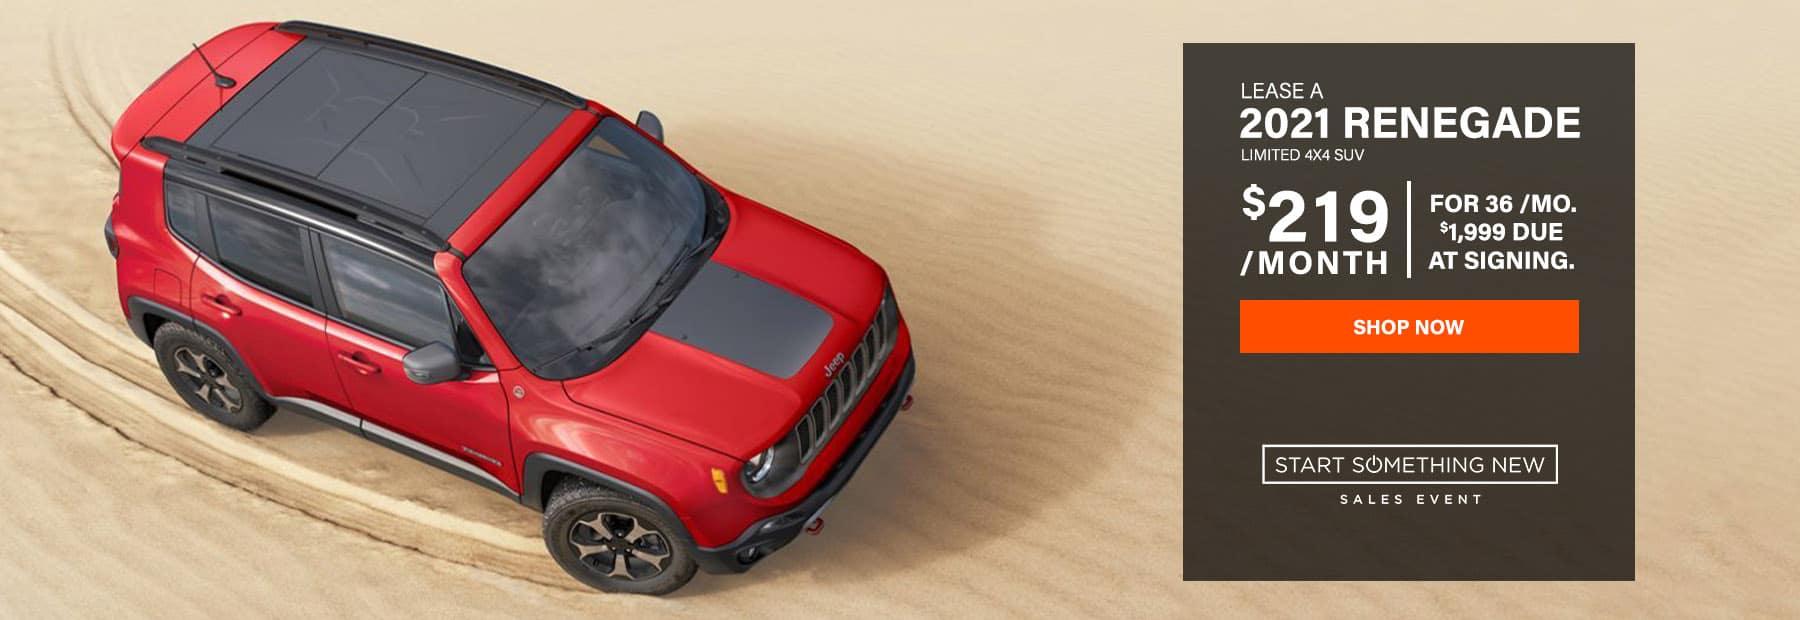 2021-01-07 Jeep Renegade Desktop